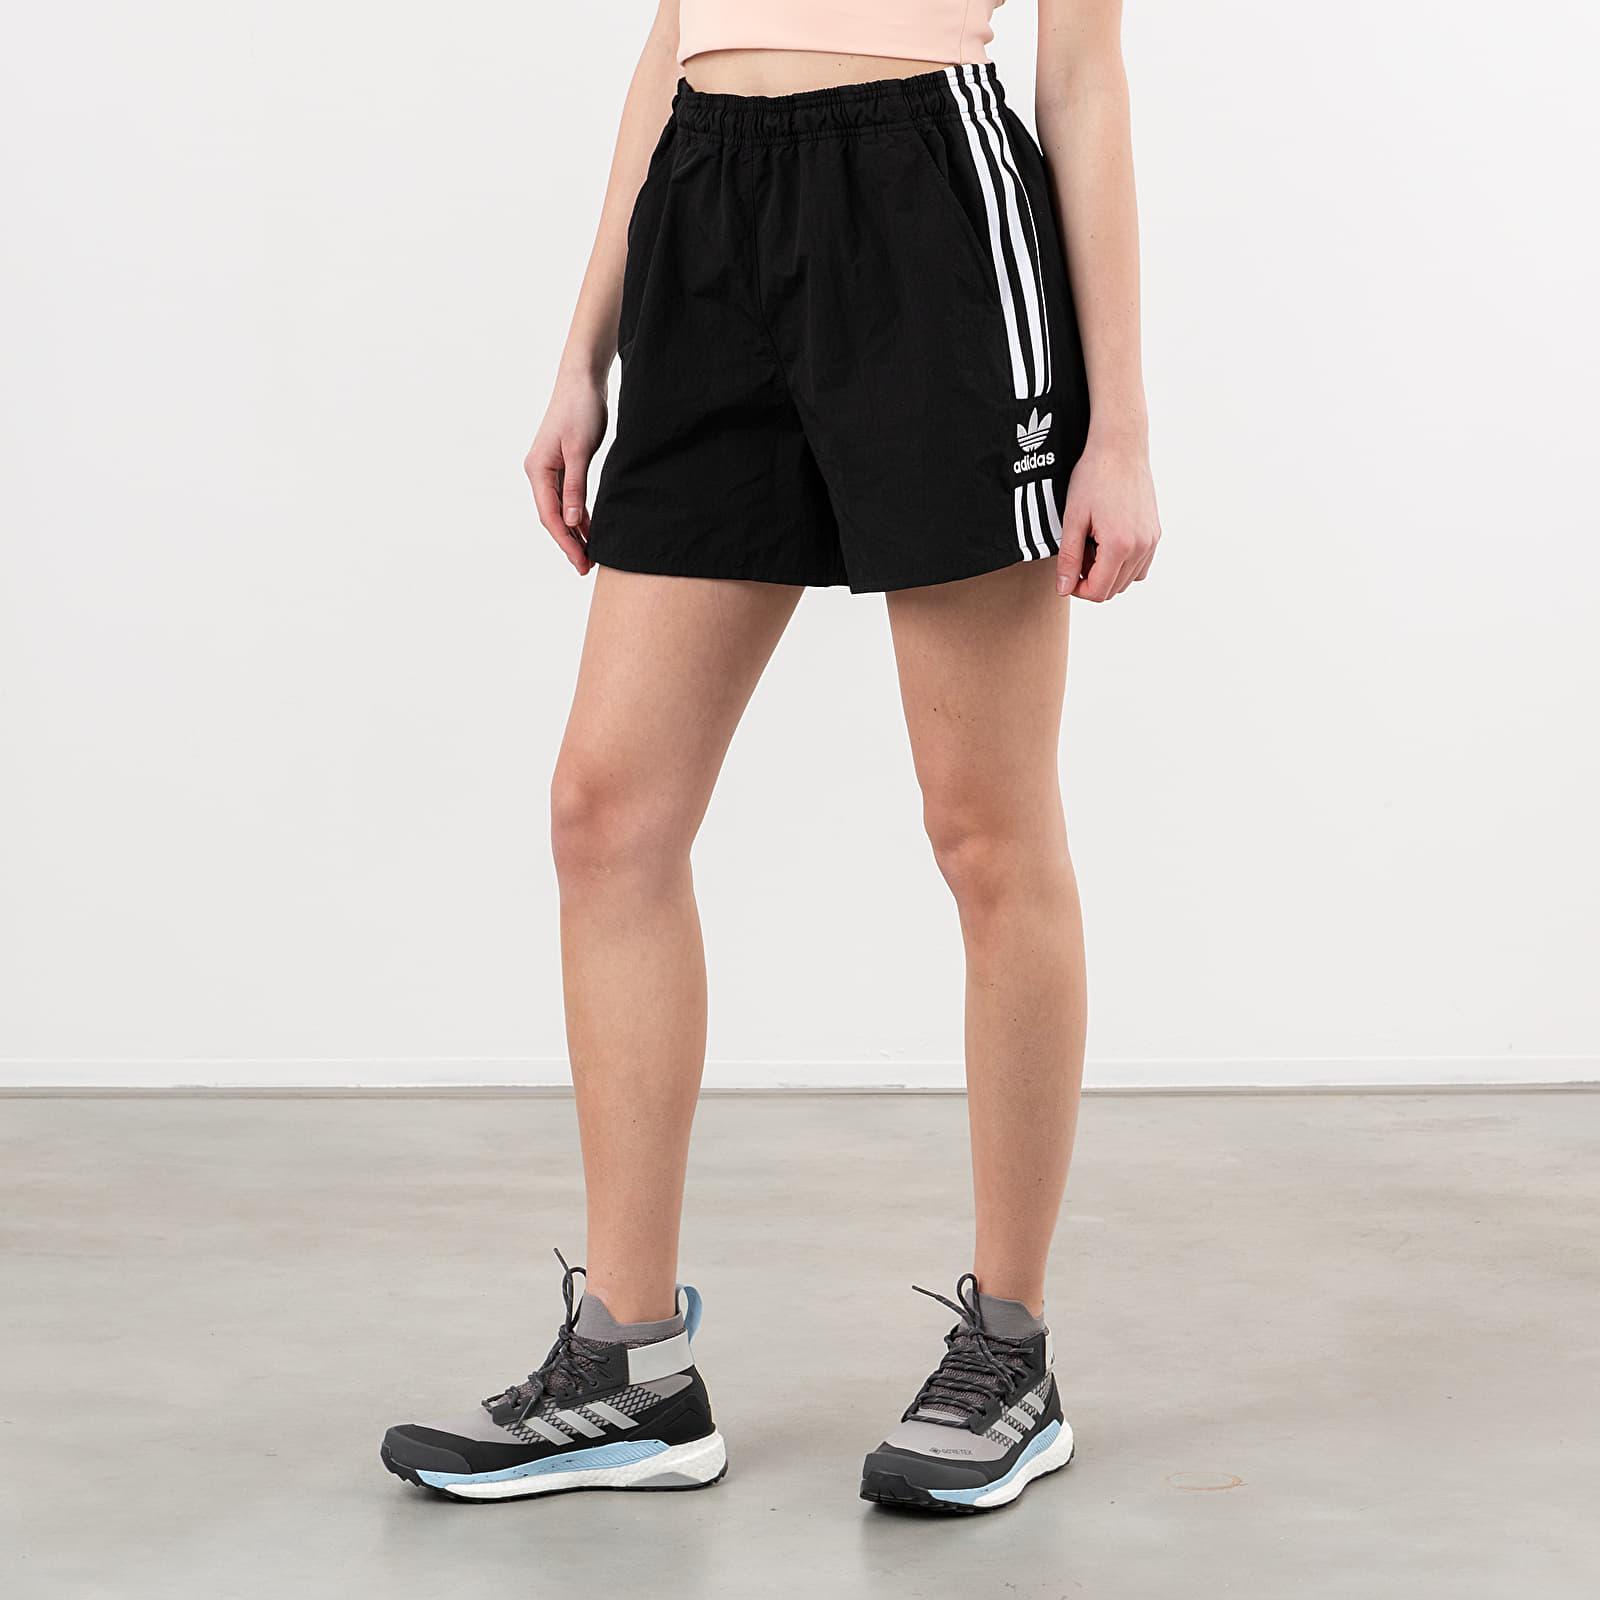 Kurzhosen adidas Shorts Black/ White